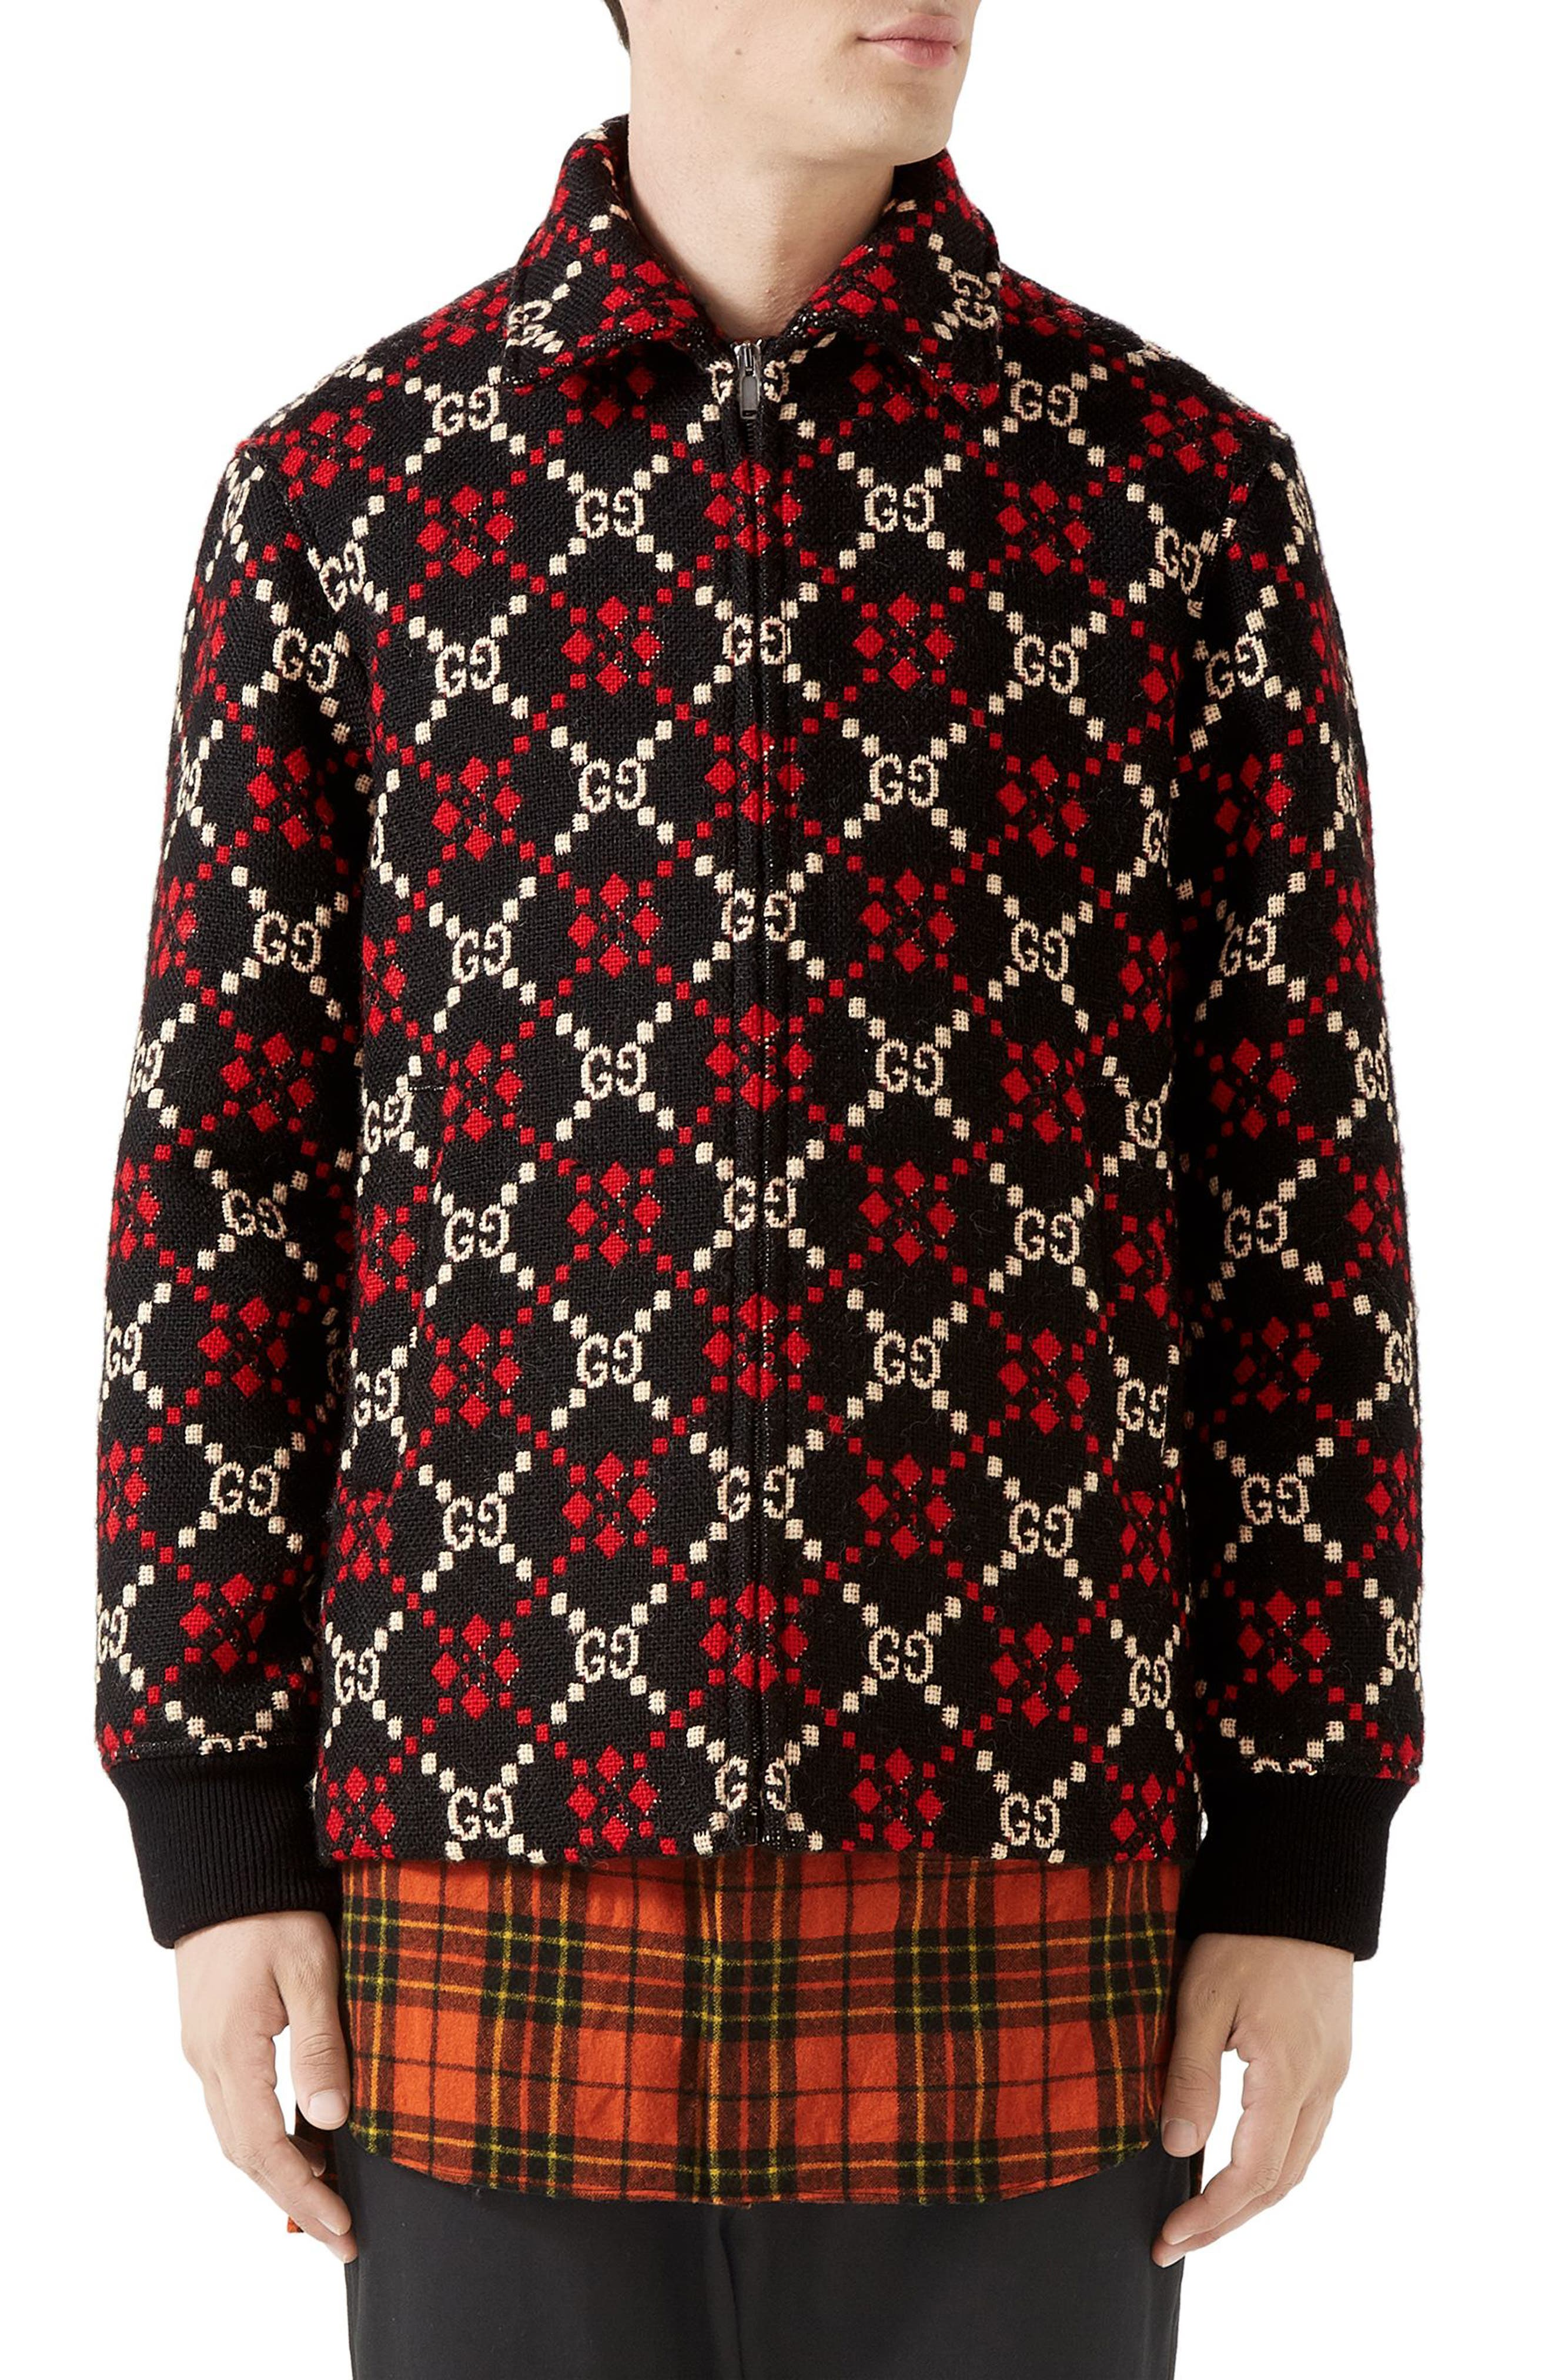 GG Wool Jacket,                         Main,                         color, BLACK